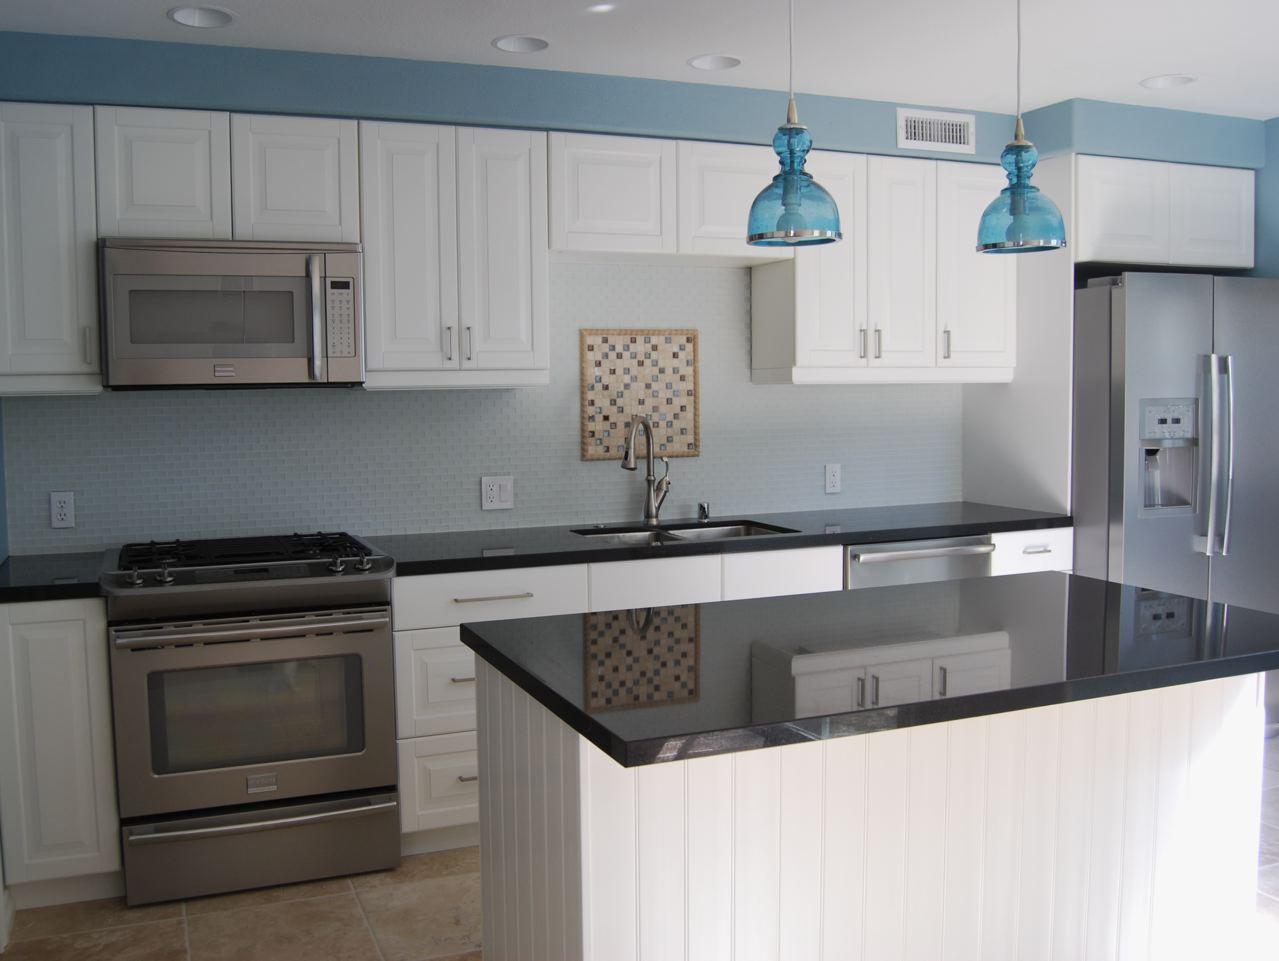 Kitchen Remodel Black Countertops